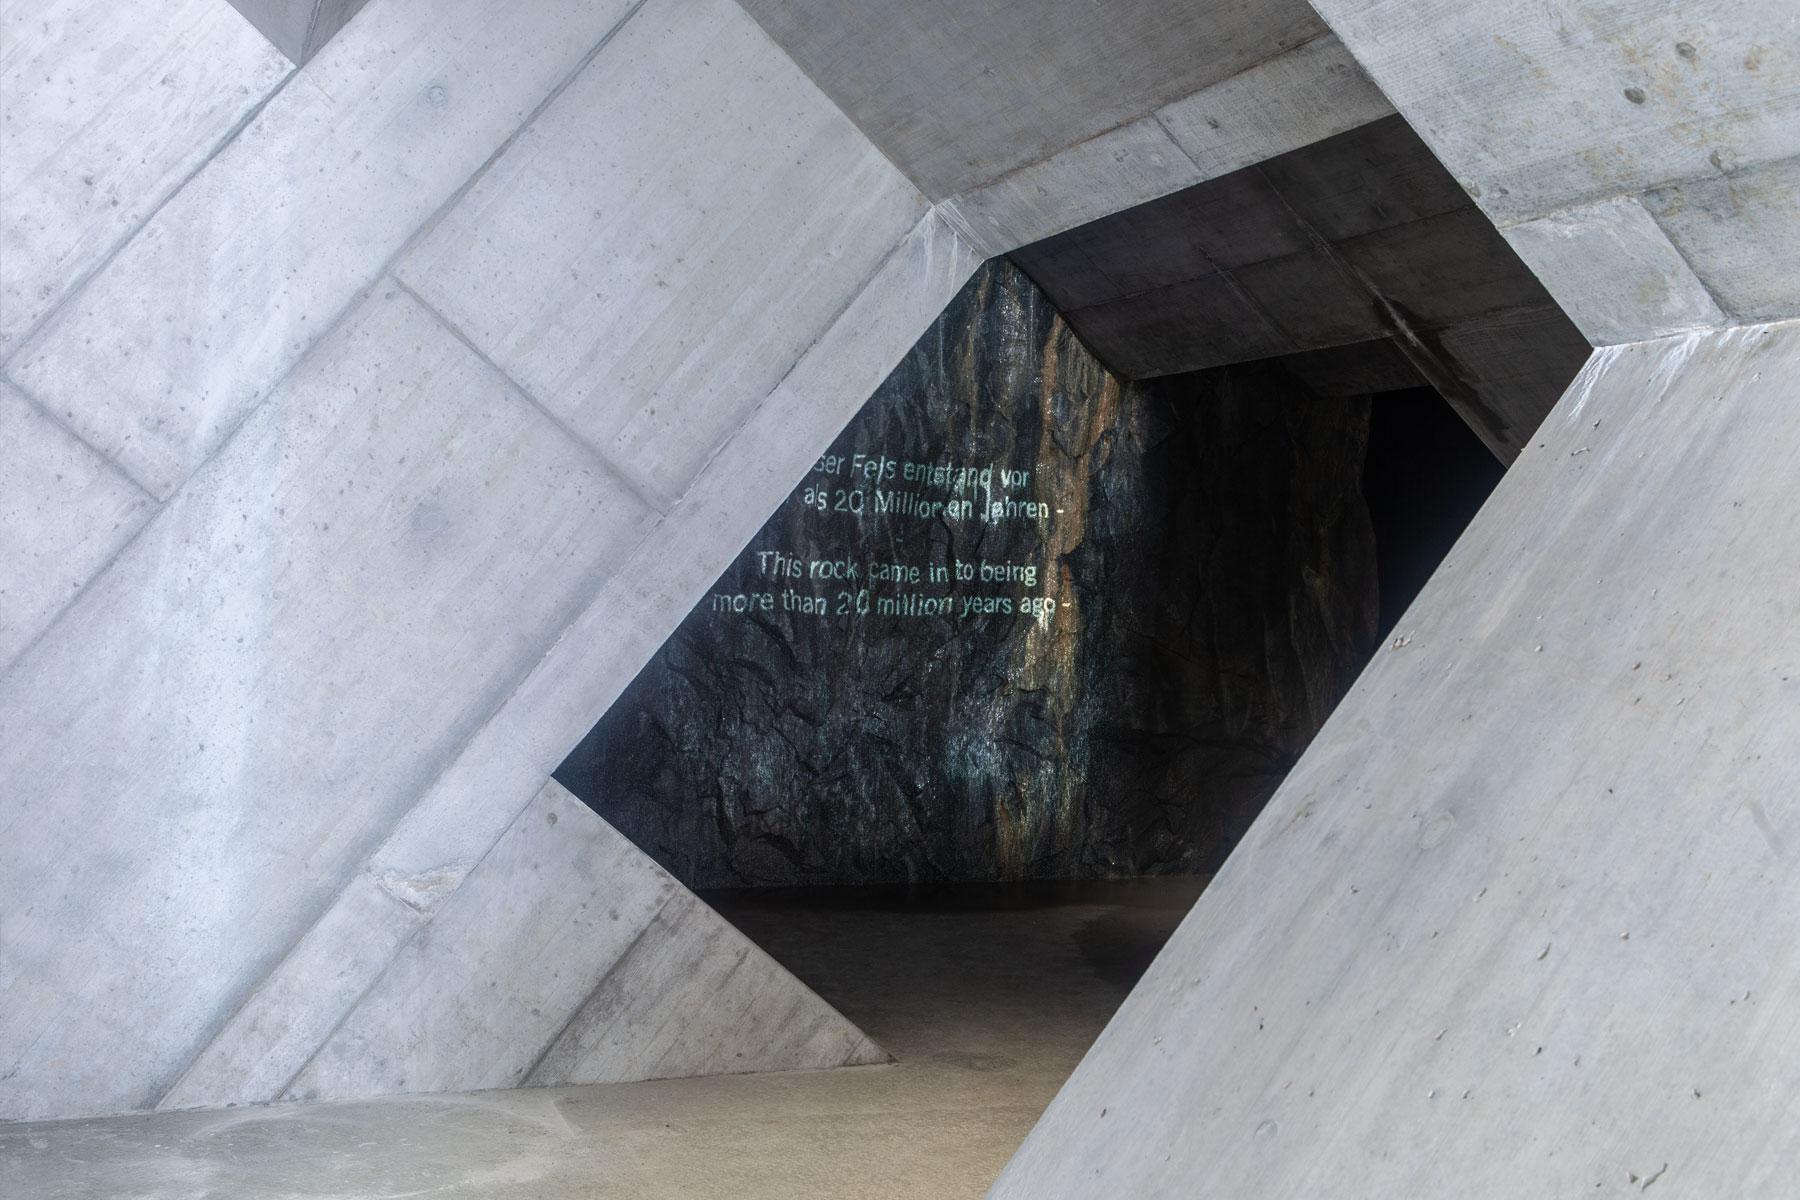 Gletschergarten Luzern Felsenwelt